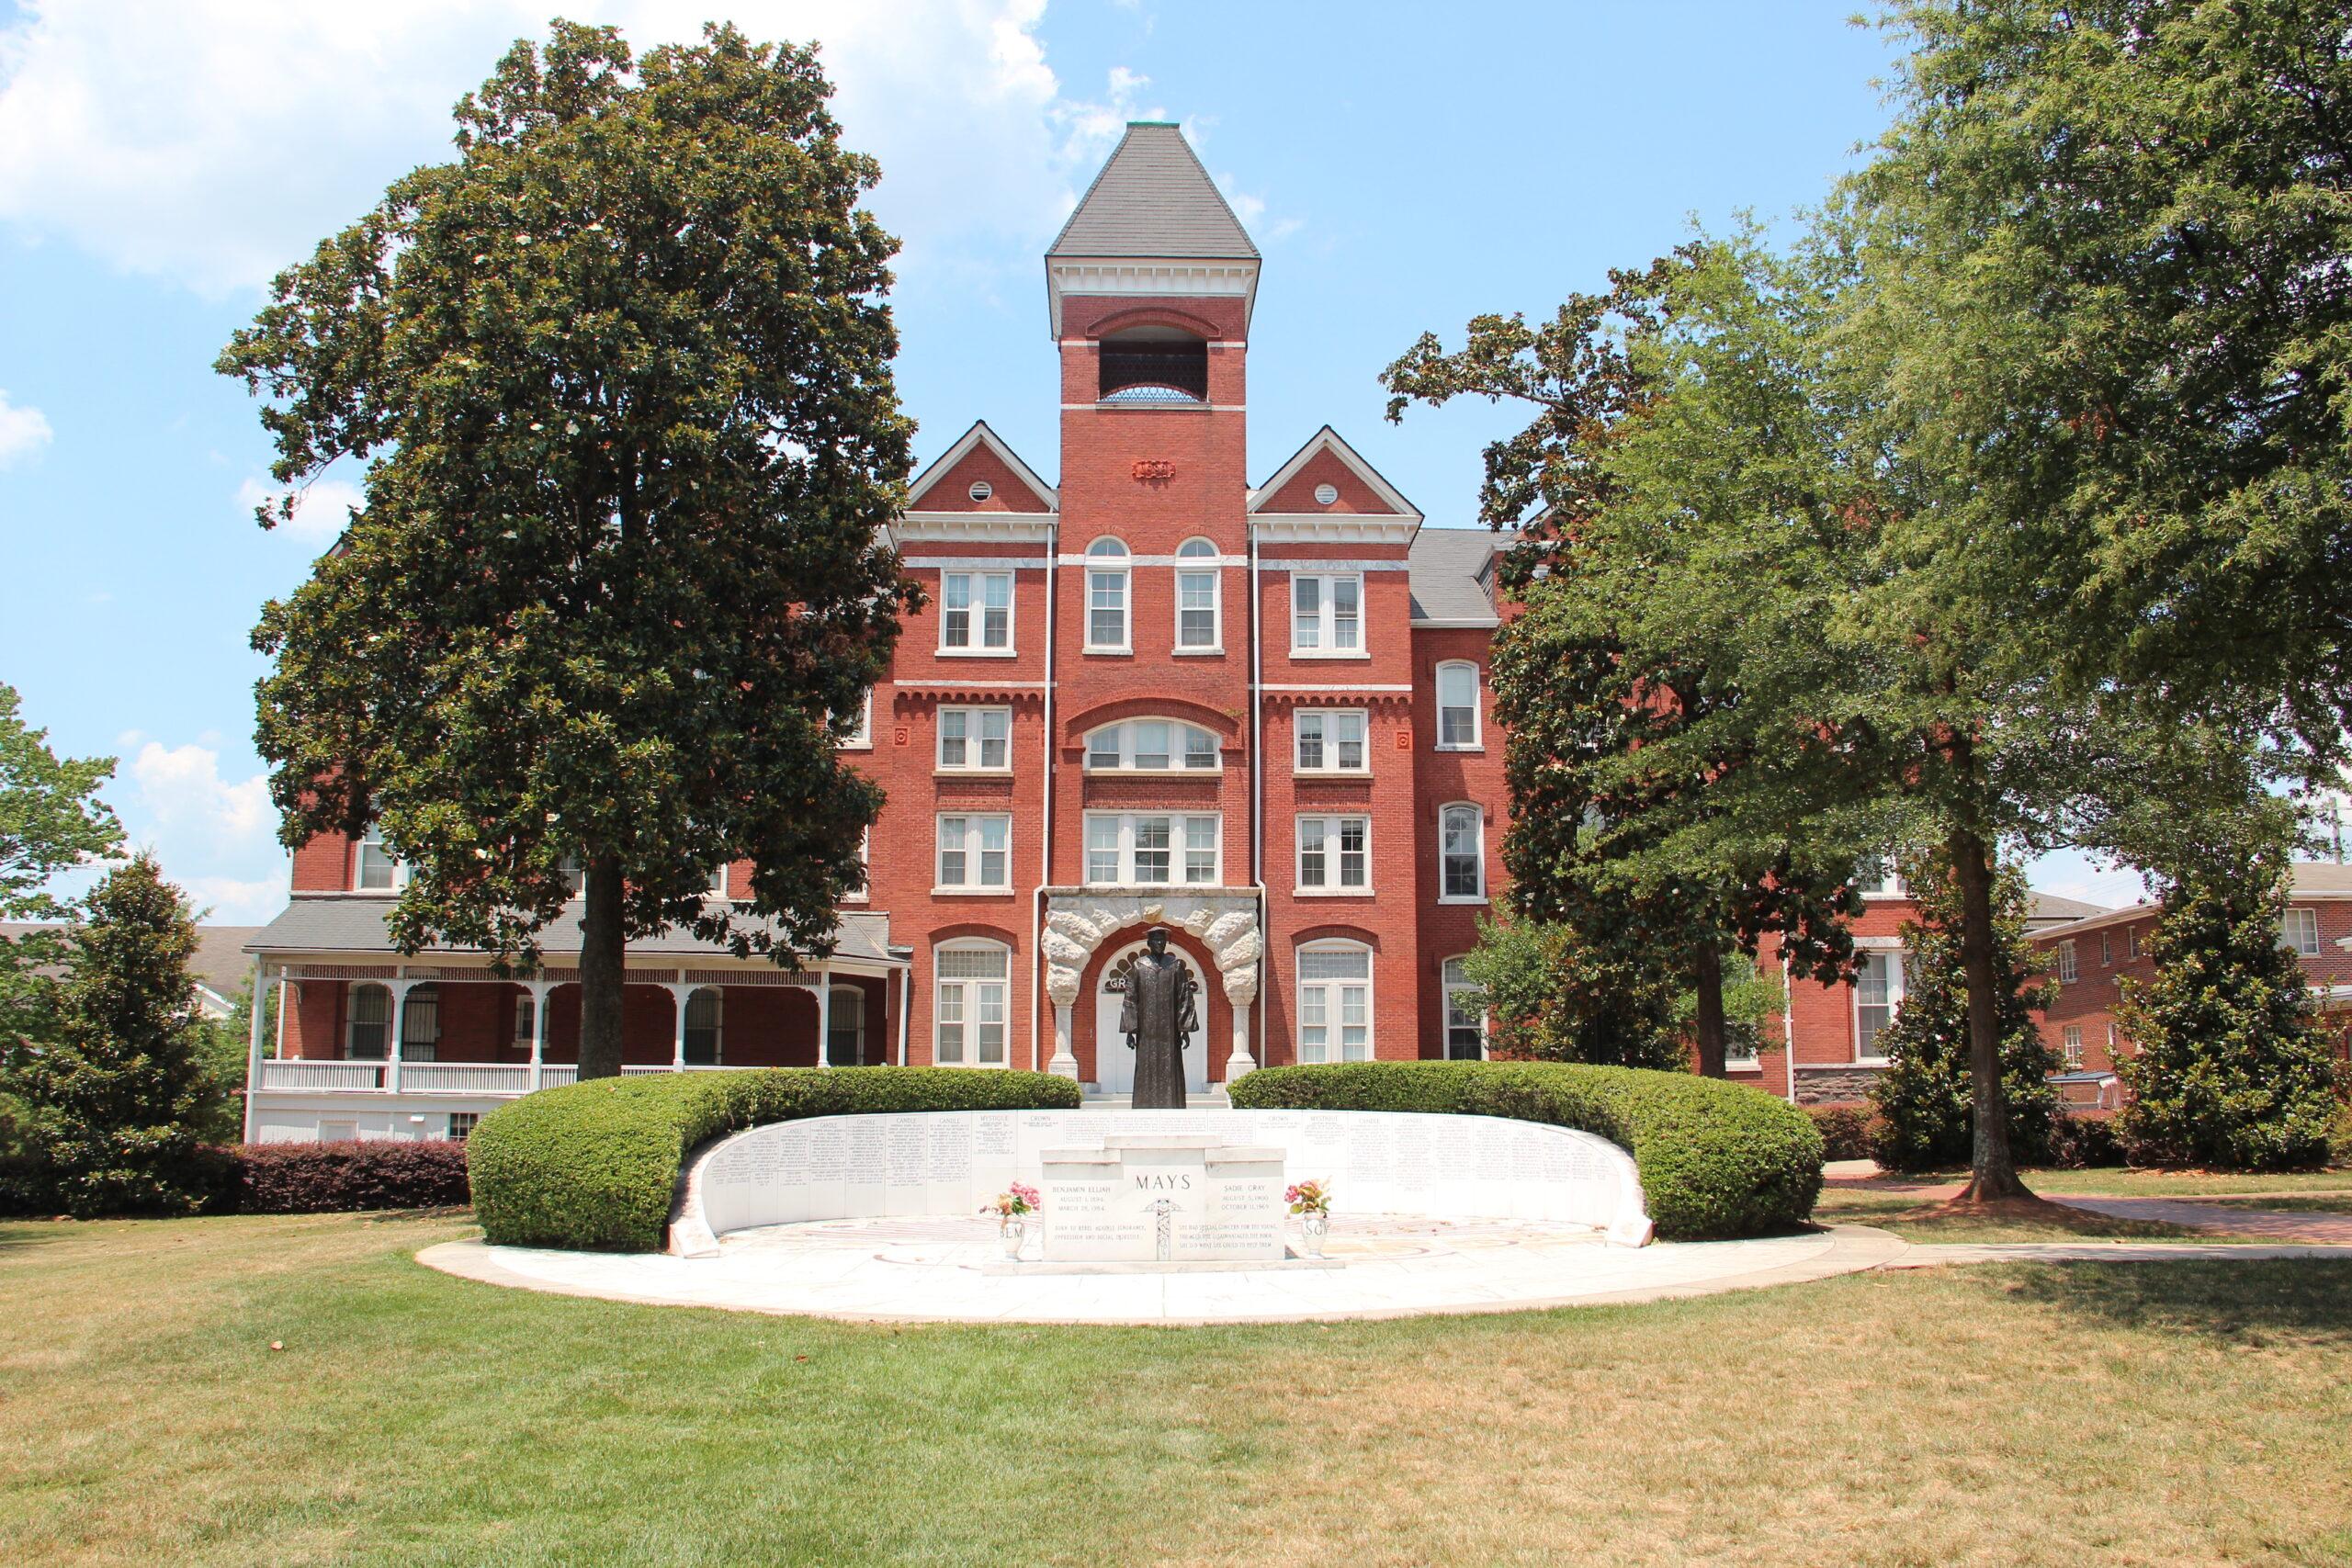 universidades-historicamente-negras-Morehouse-College